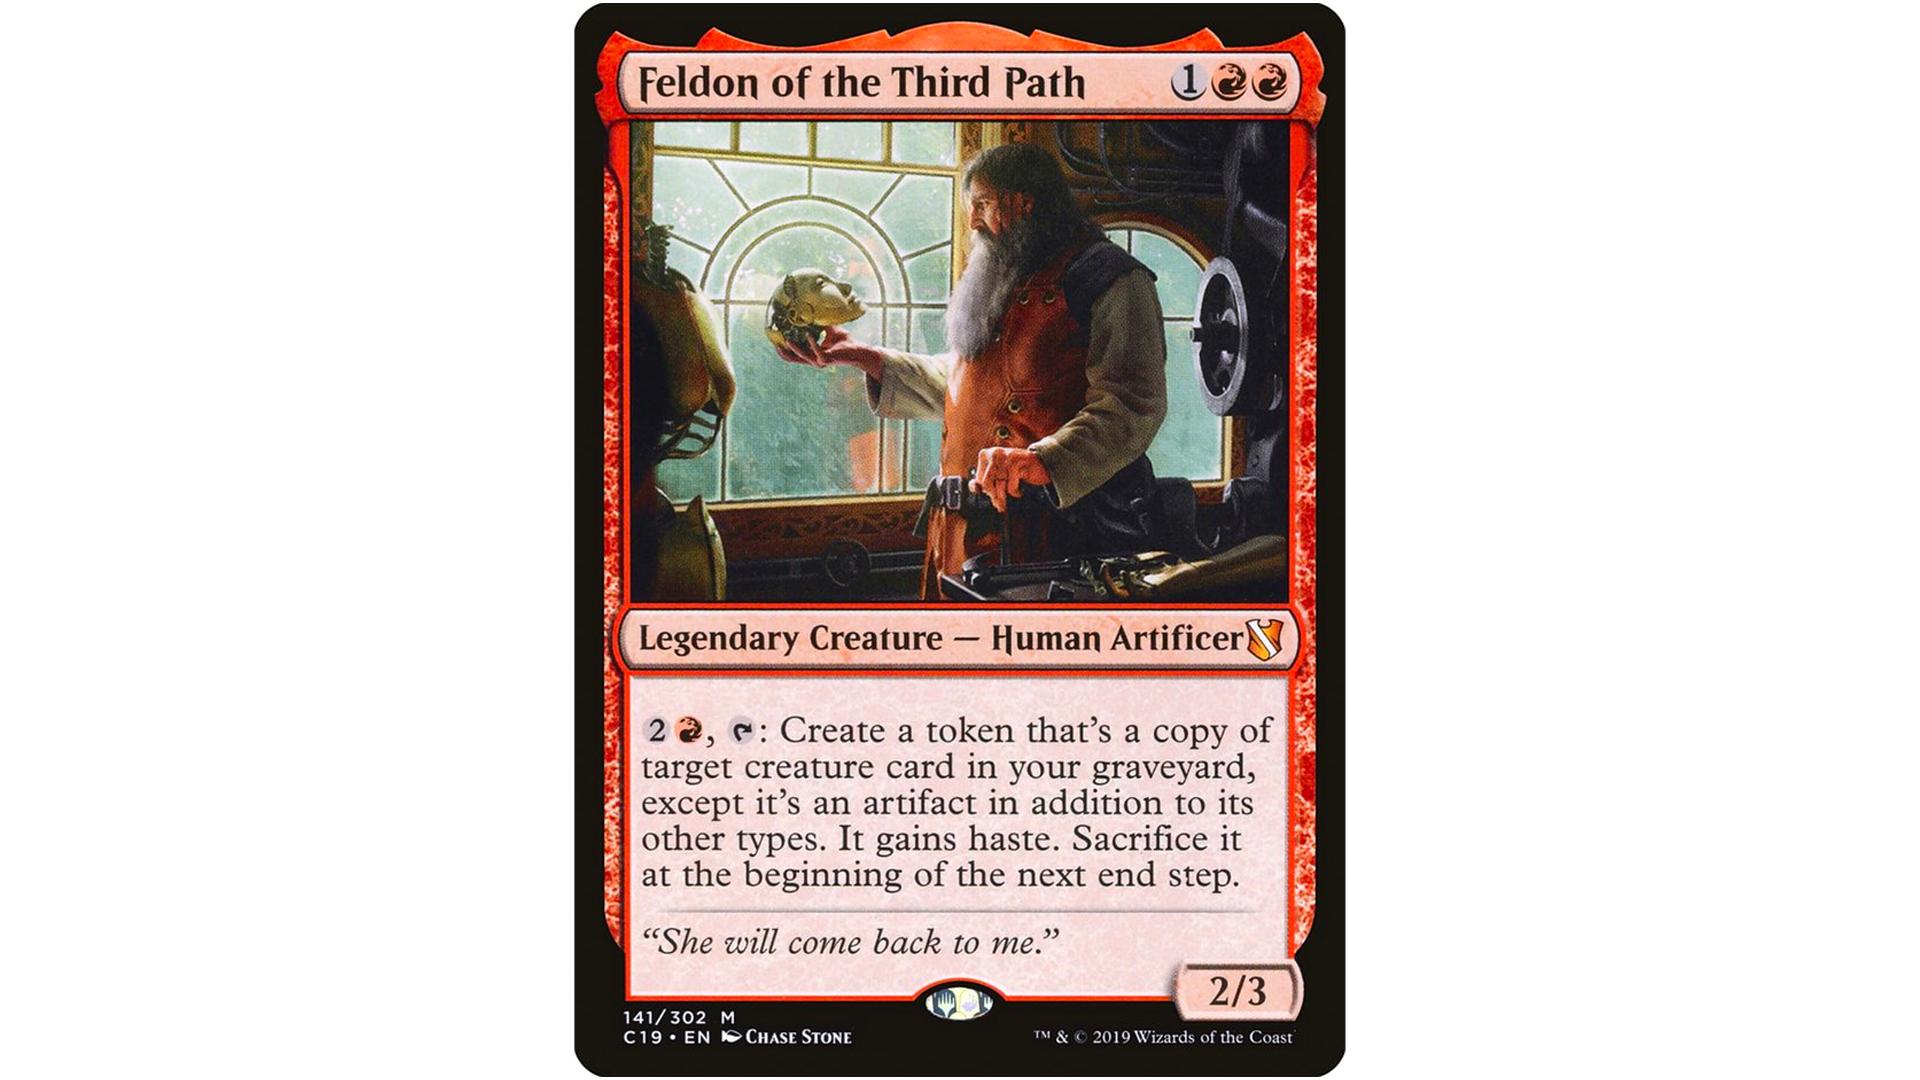 mtg-christmas-card-feldon-of-the-third-path.png